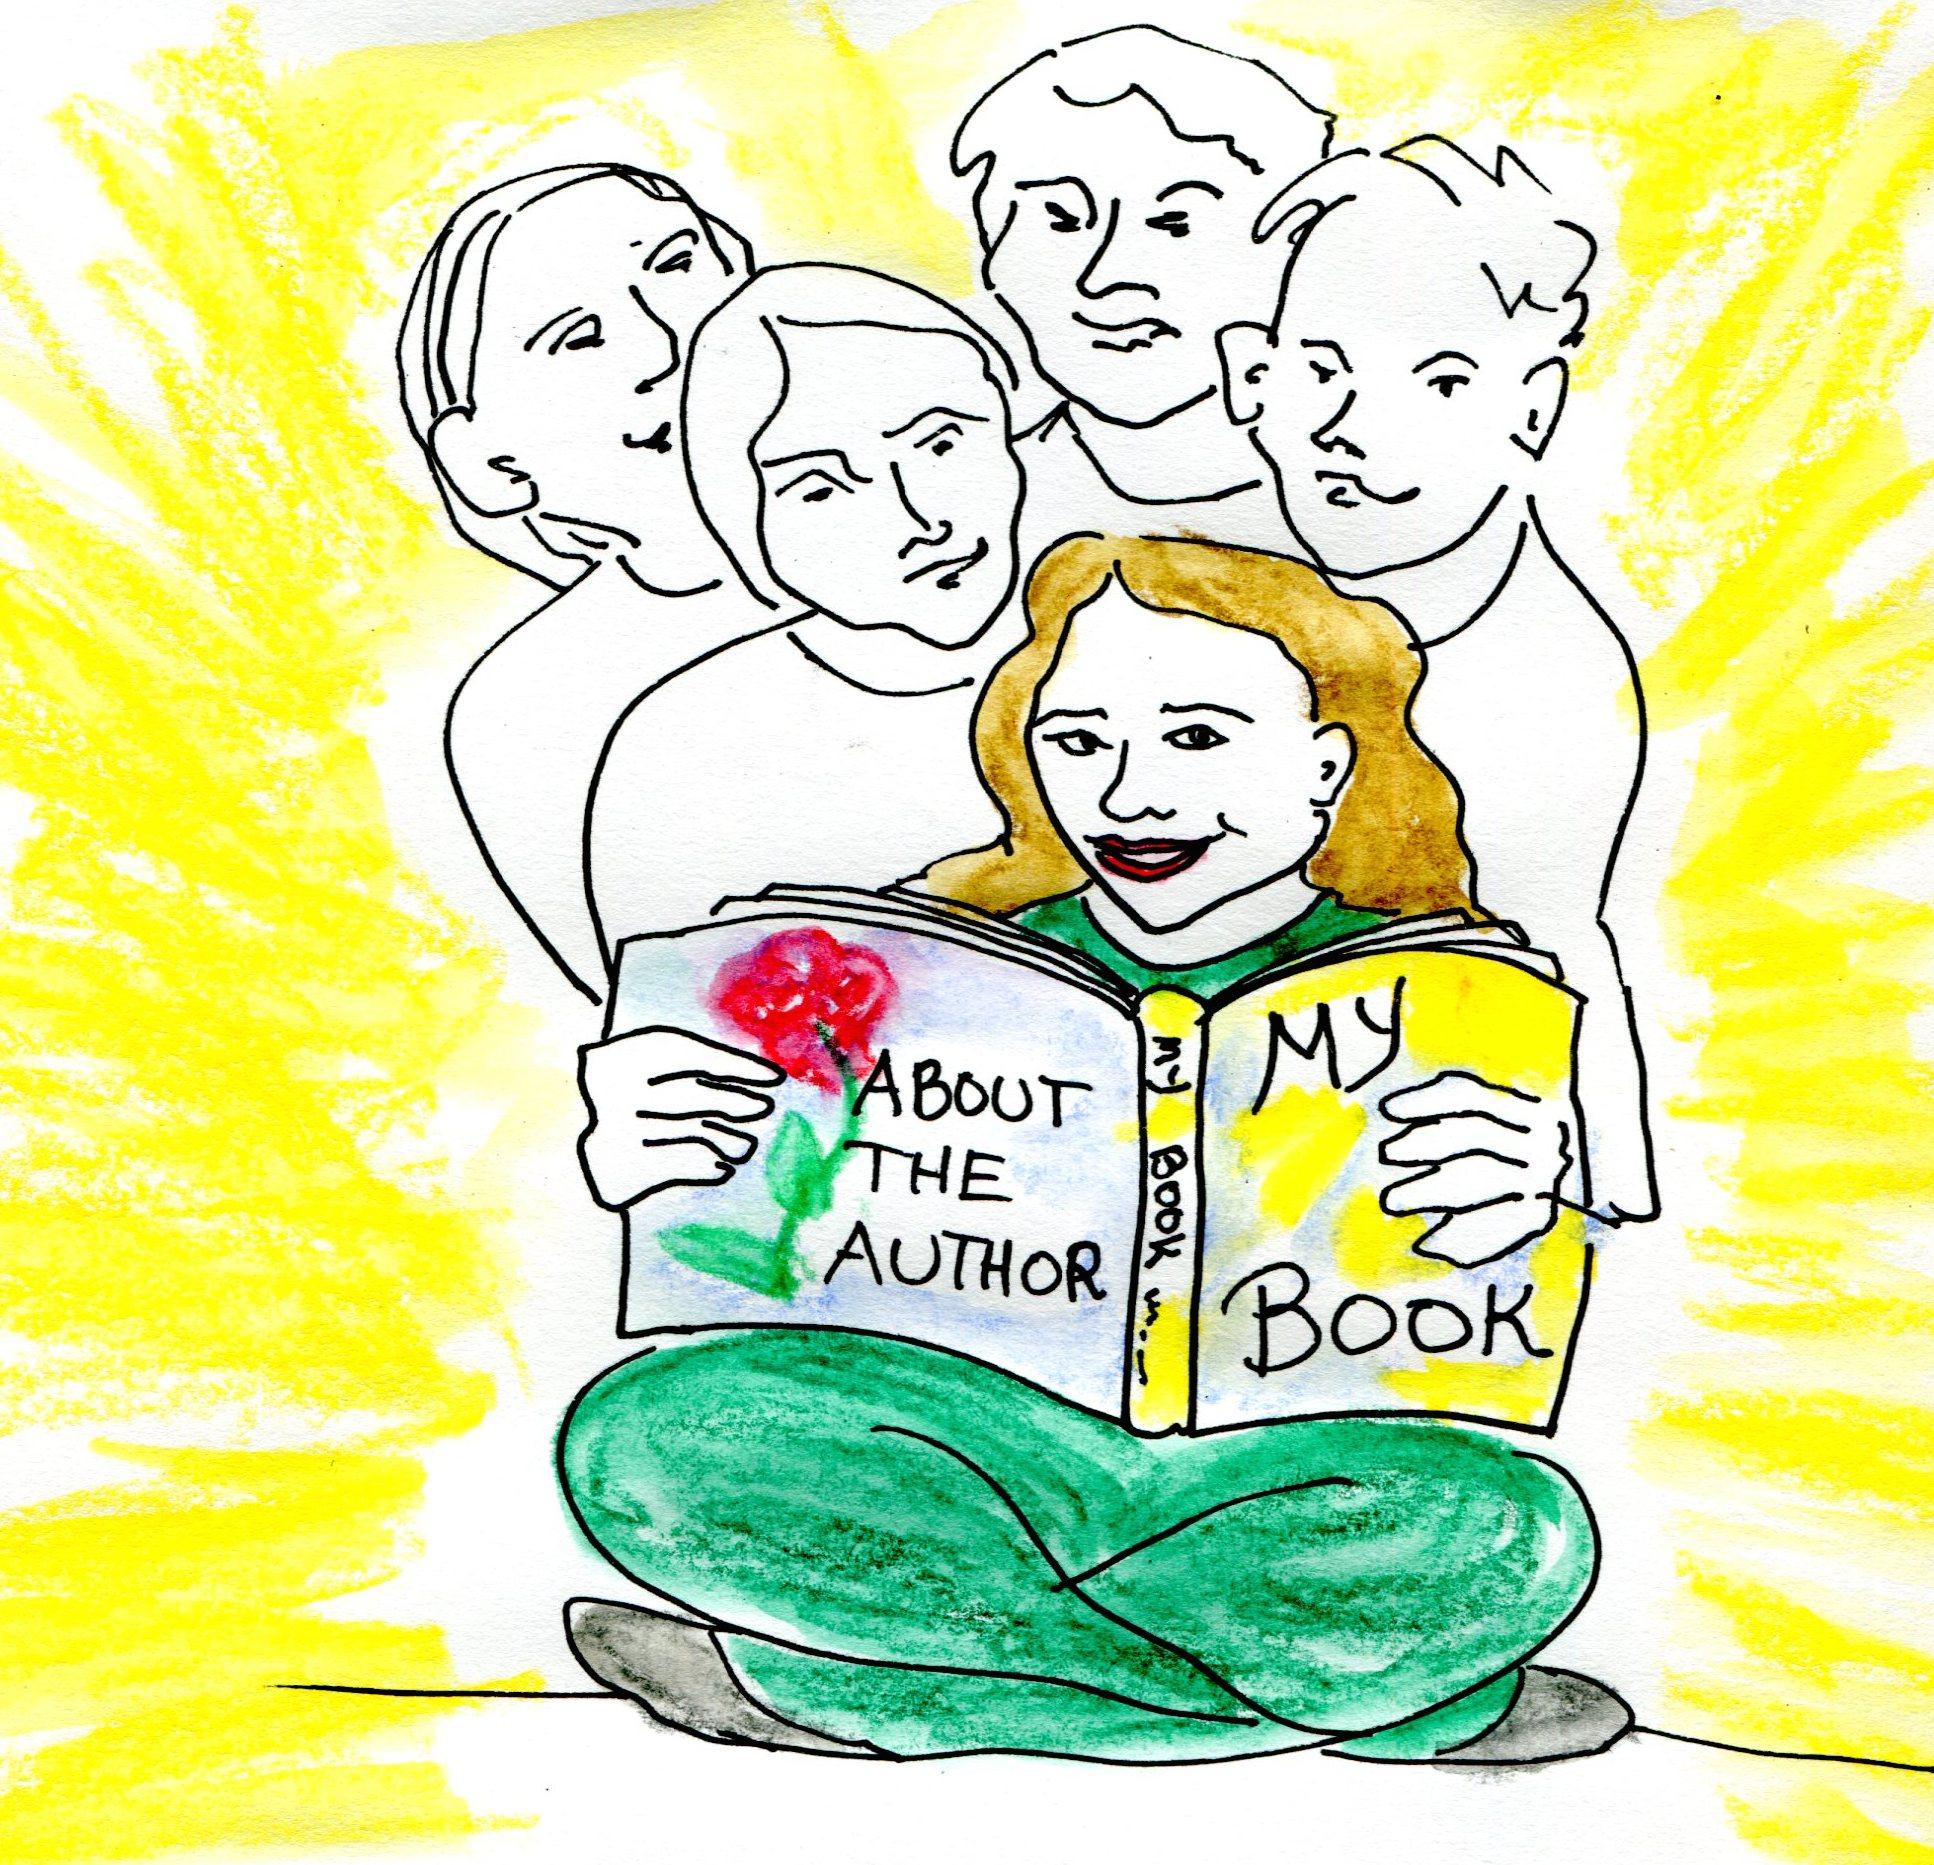 self-publishing mentoring, ILLUSTRATION BY NAOMI ROSE